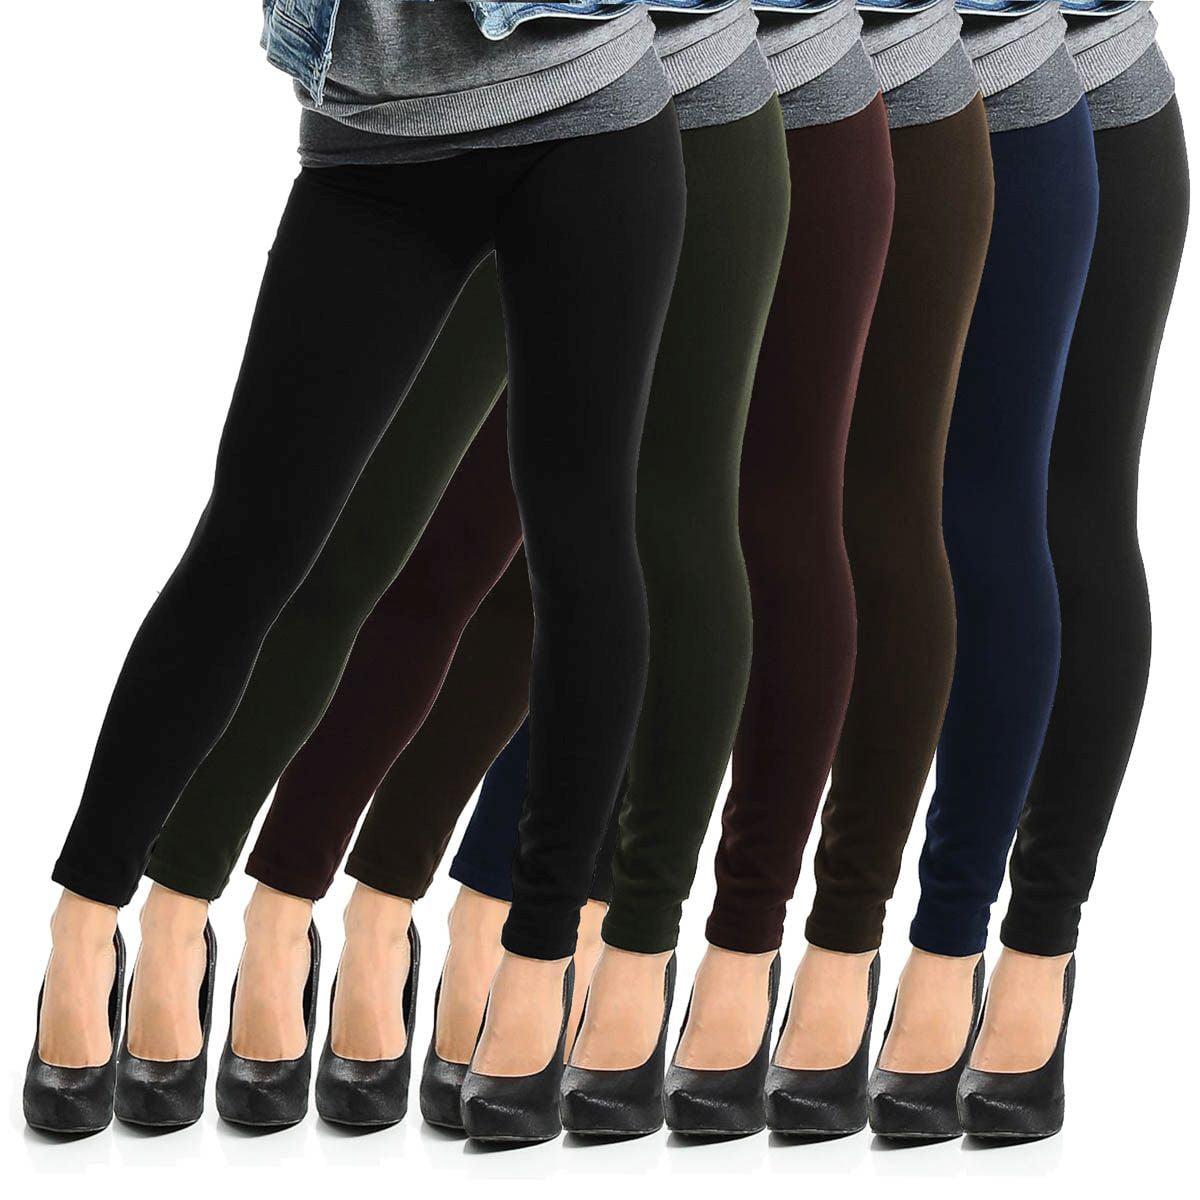 6pk Fleece-Lined Leggings Opaque Footless Winter Warm Adult One ...